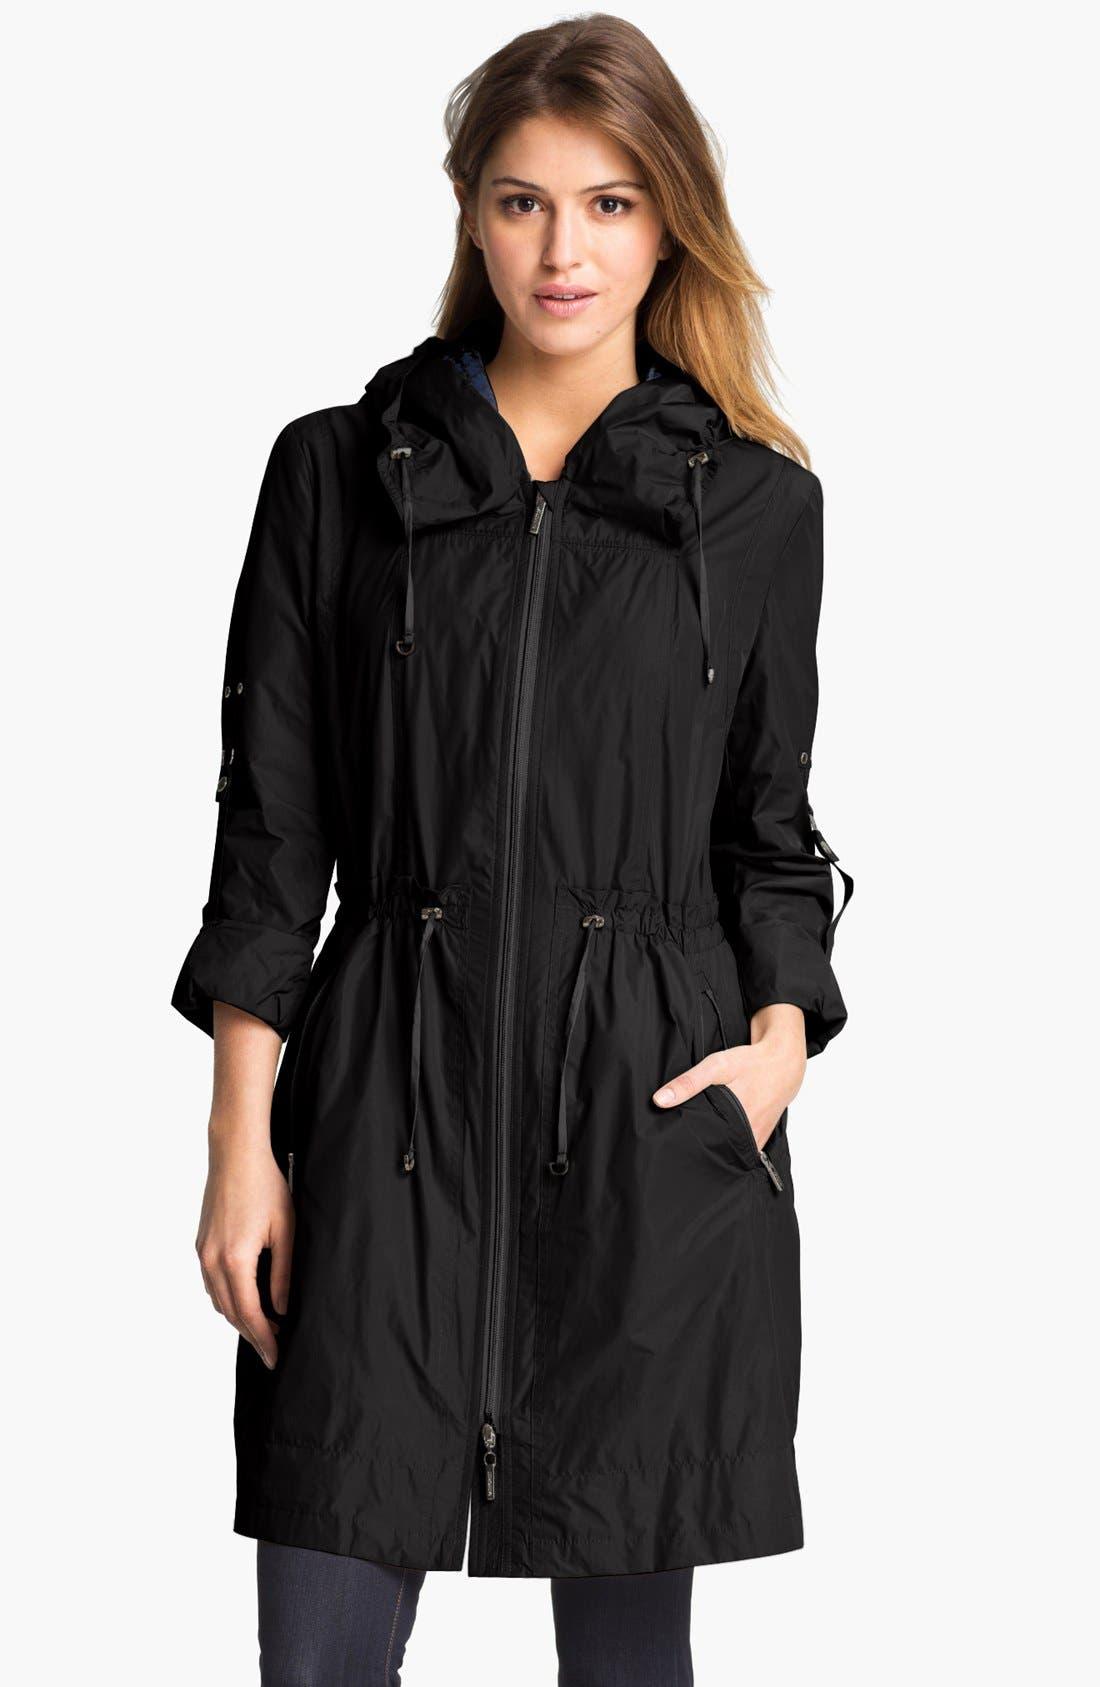 Main Image - RAINFOREST Packable Hooded Raincoat